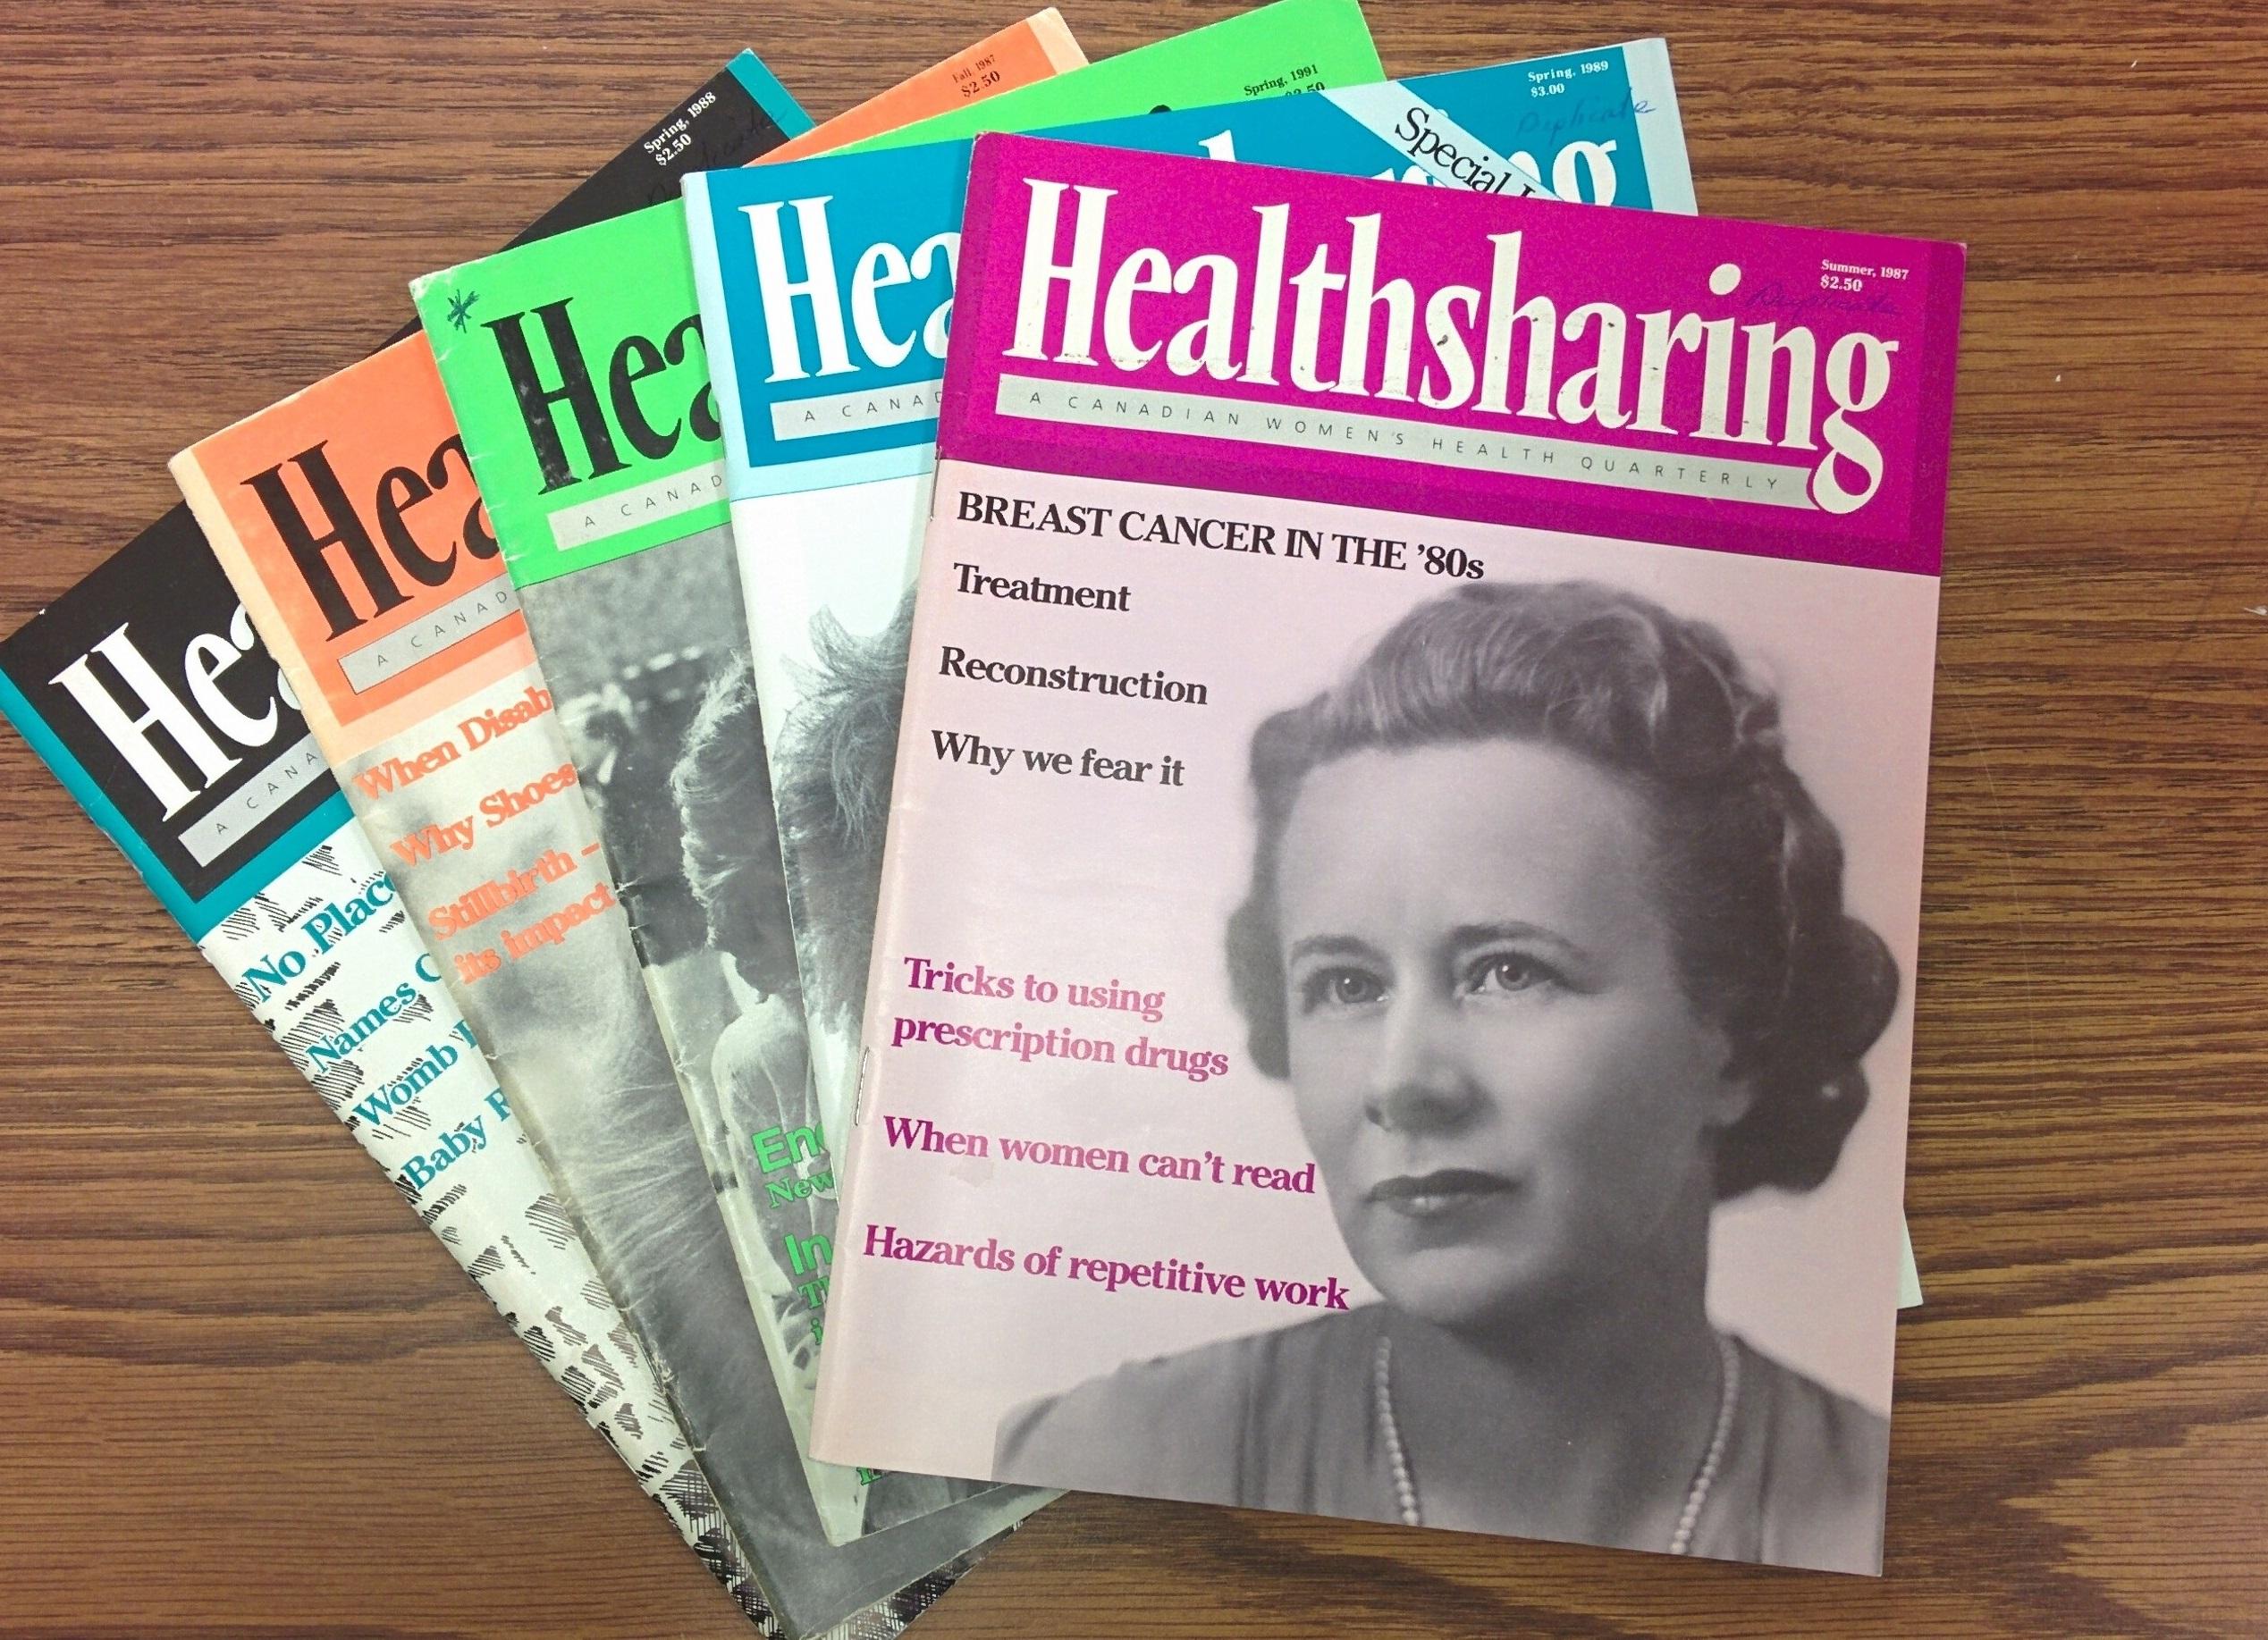 Display of Healthsharing Magazines